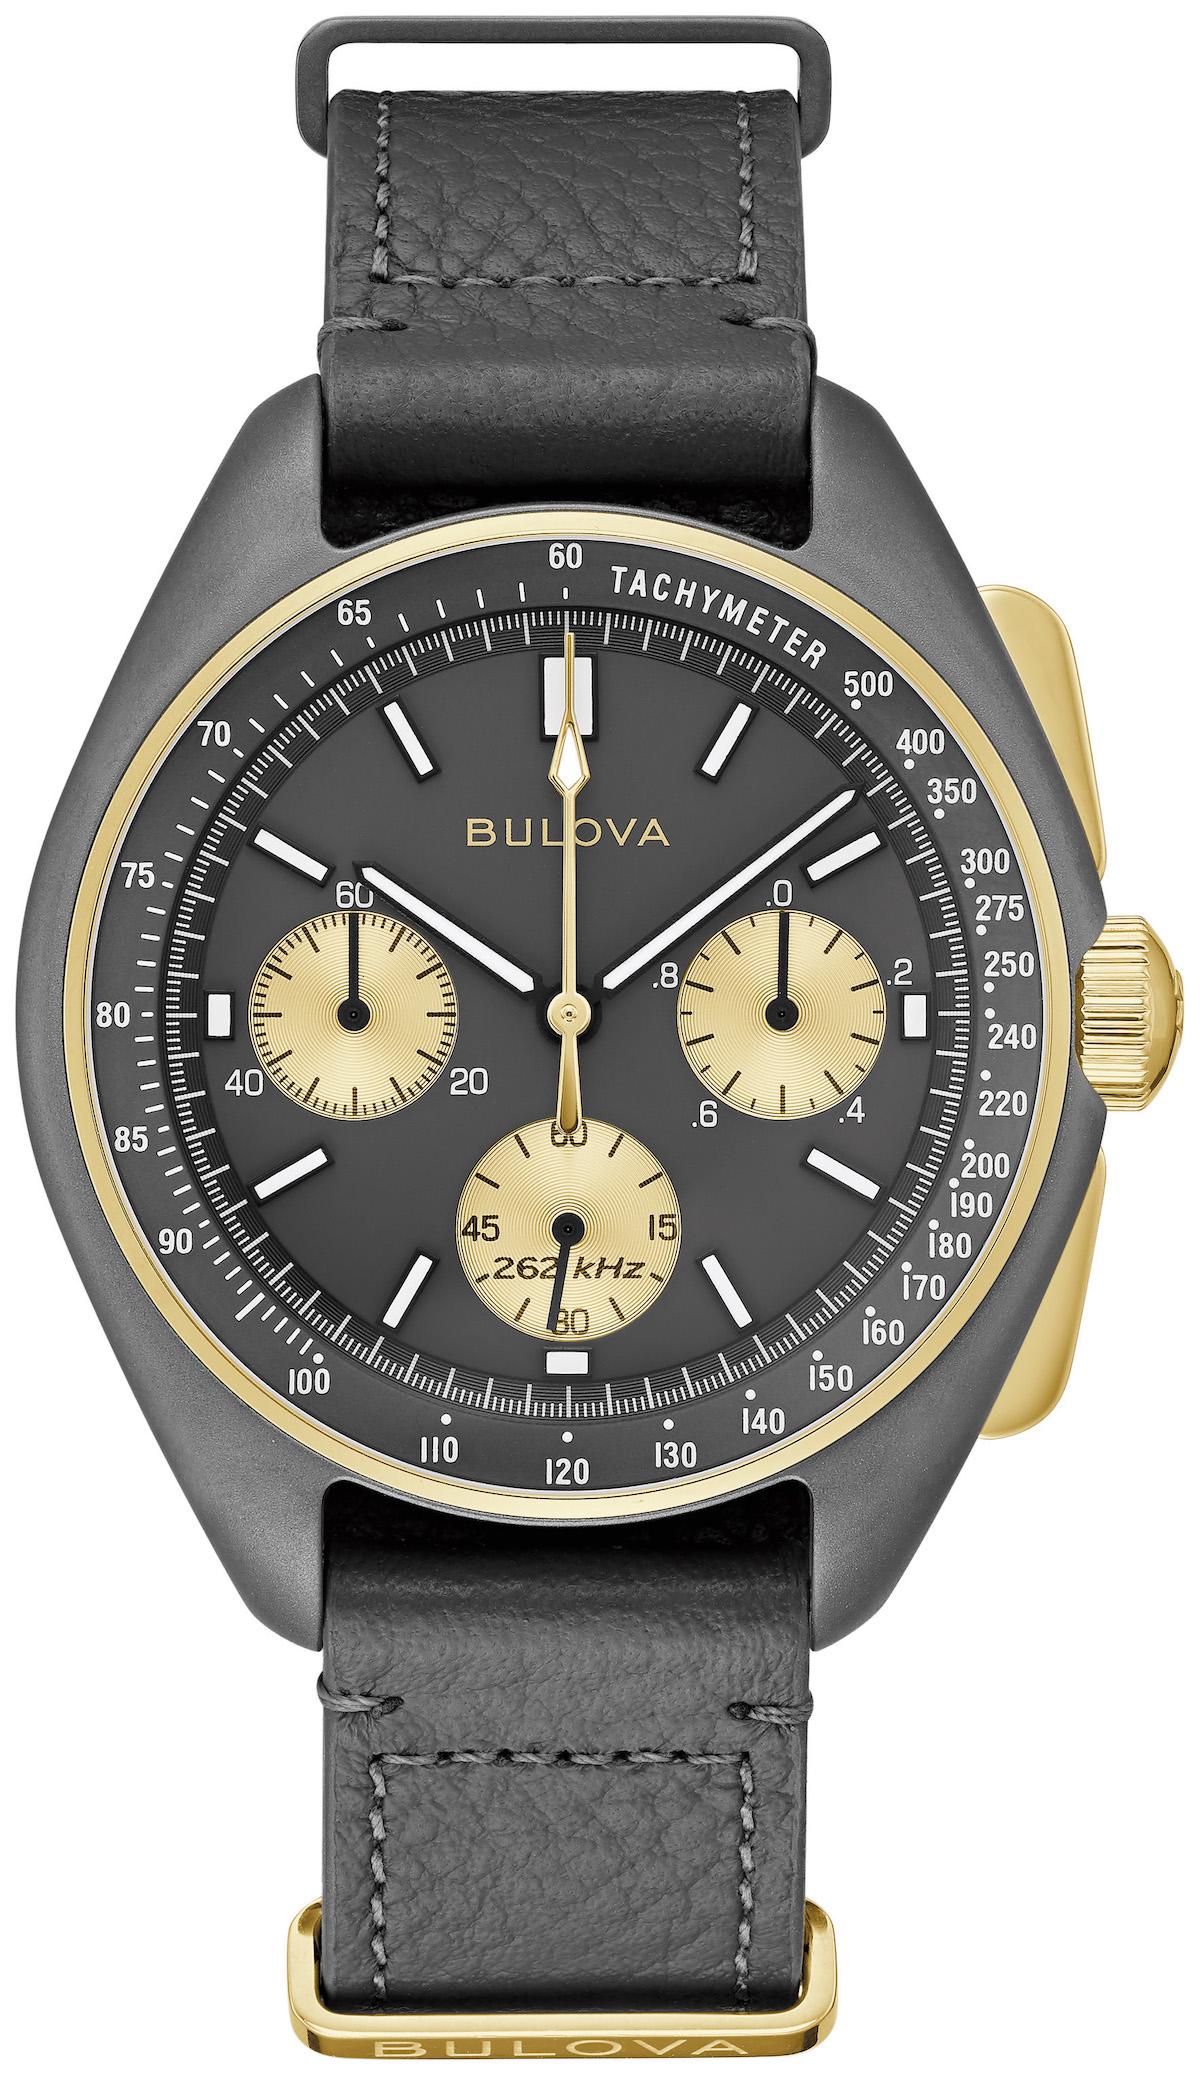 Bulova unveils a 50th Anniversary Limited Edition Lunar Pilot watch,